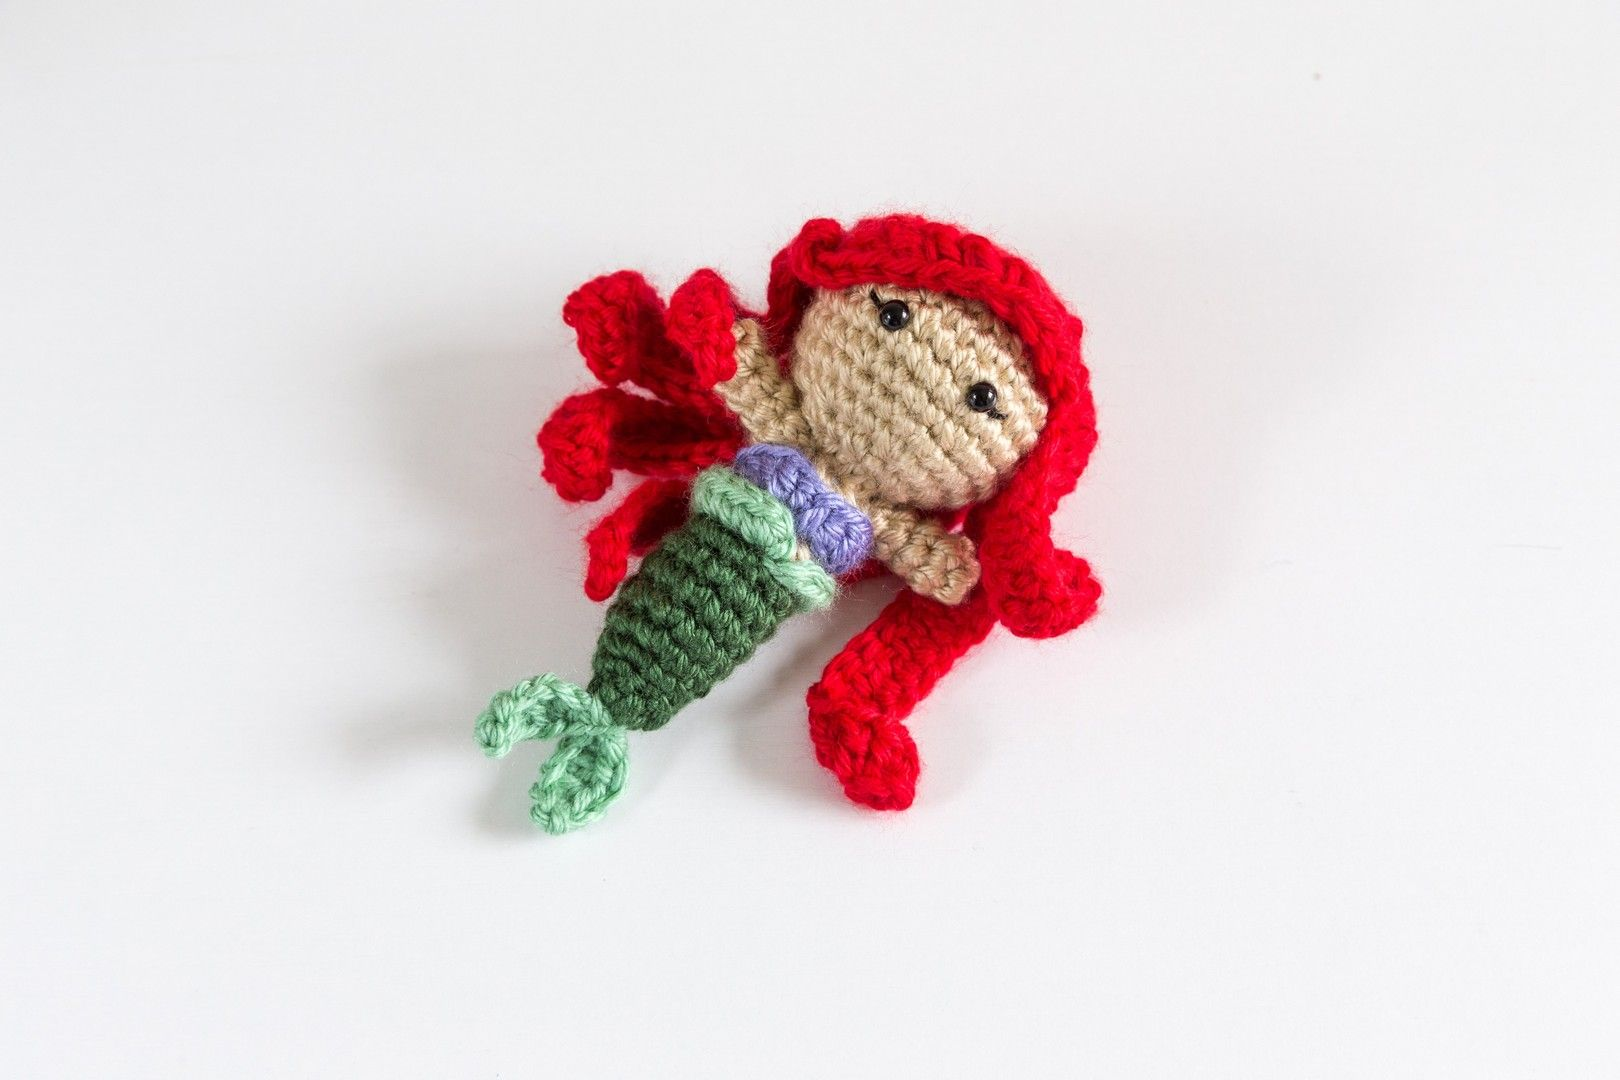 Disney Princess Ariel the Little Mermaid Crochet Amigurumi Doll ...